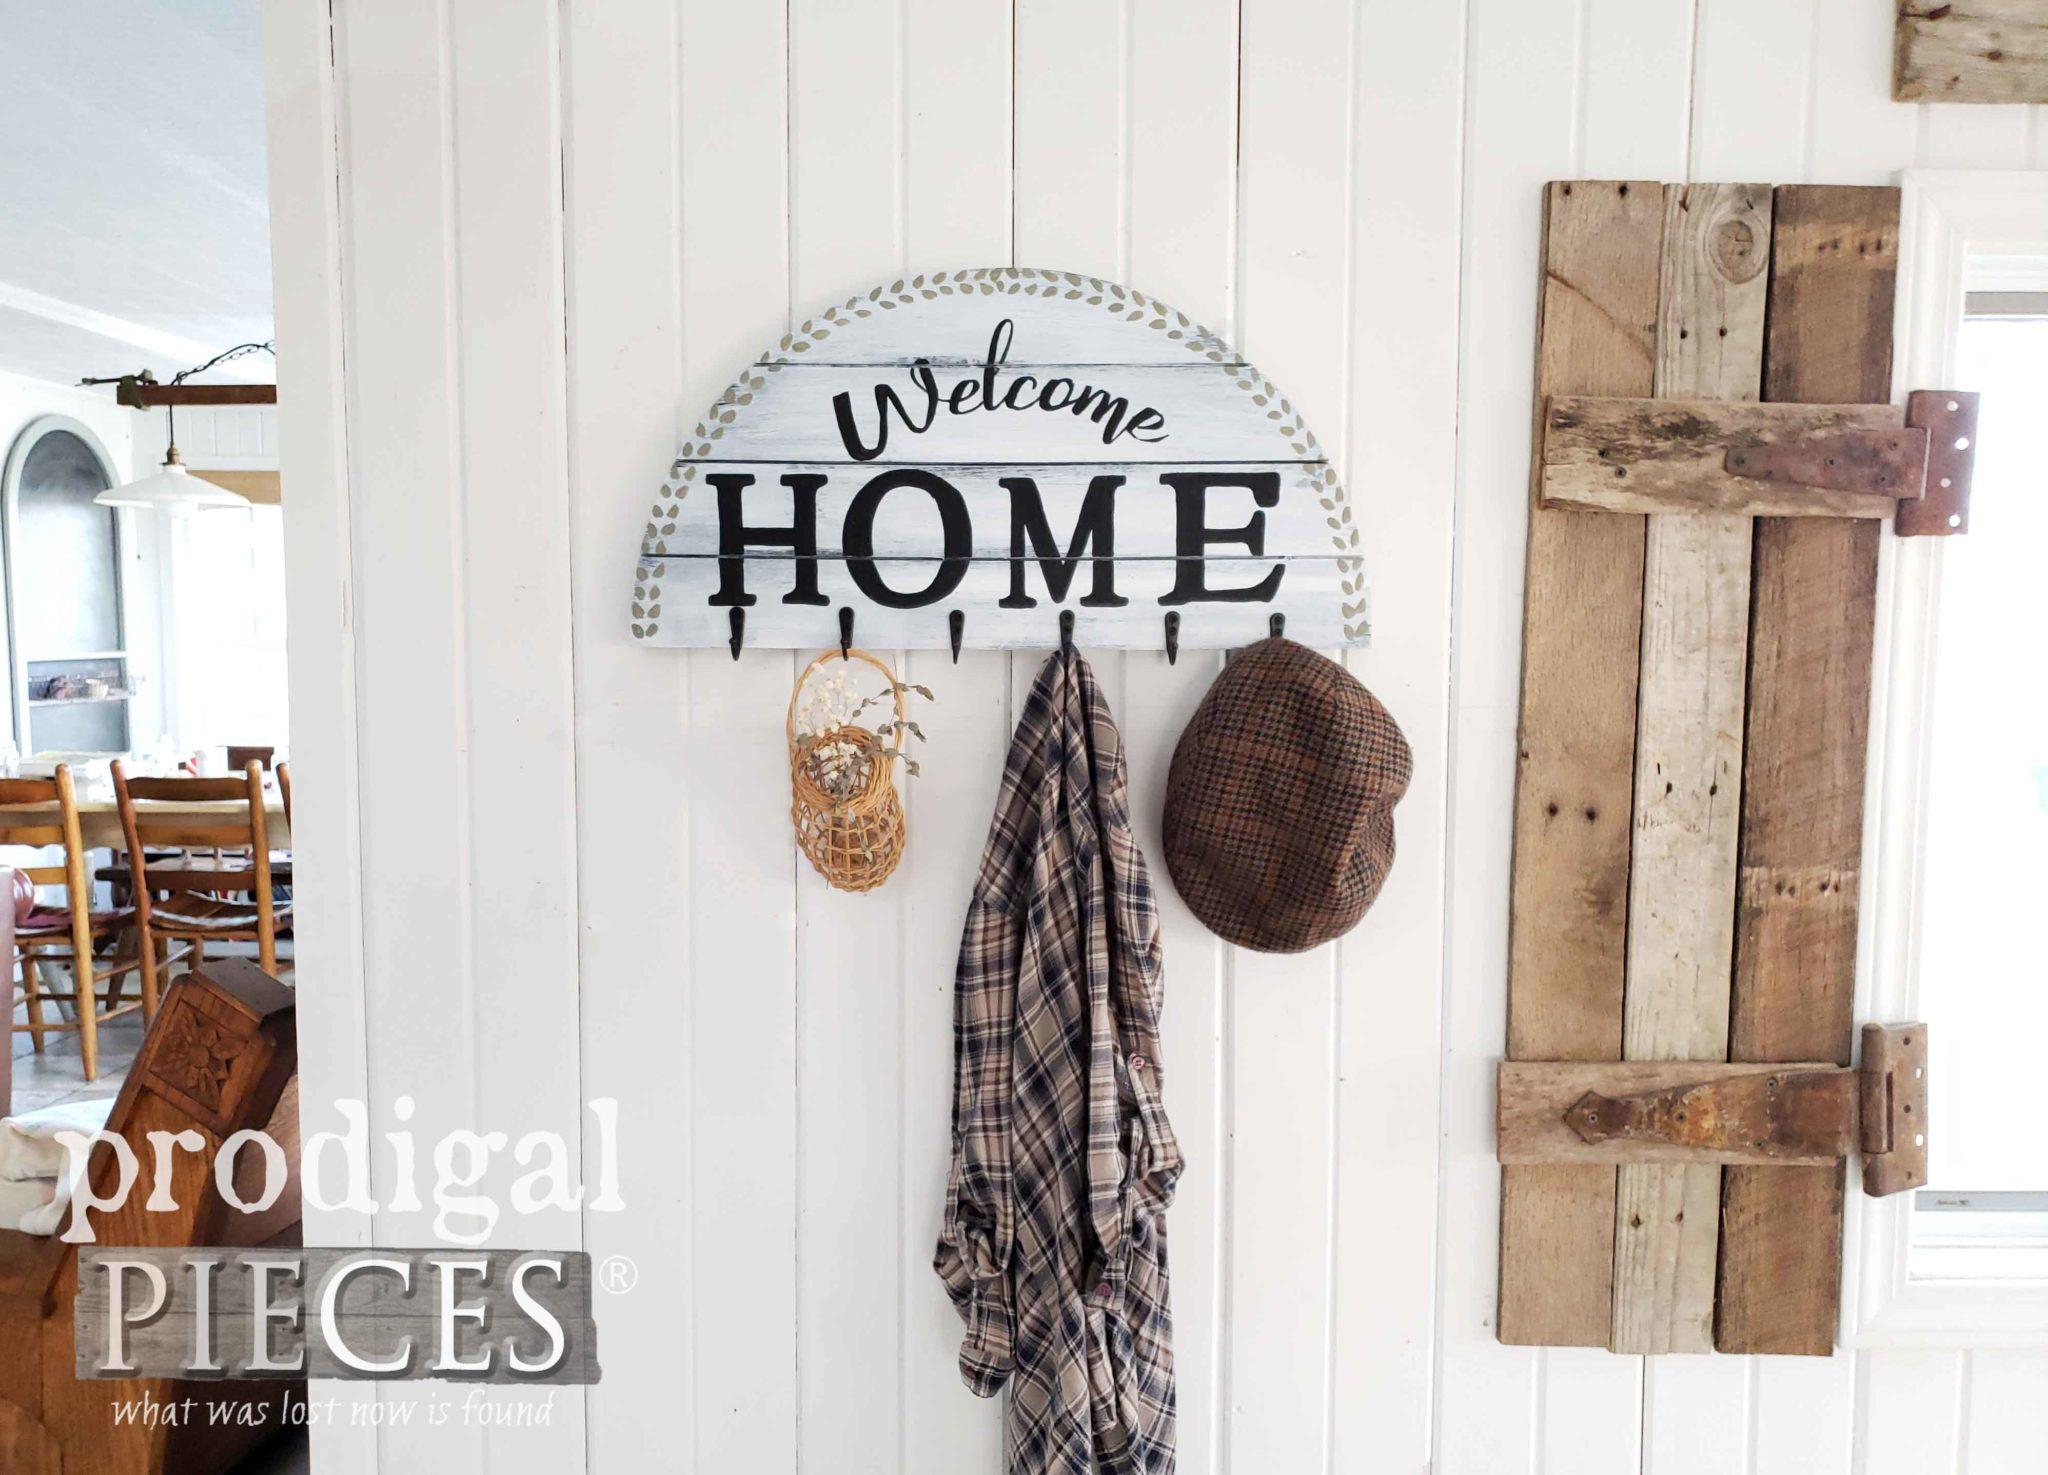 Modern Farmhouse Coat Rack DIY Tutorial by Larissa of Prodigal Pieces | Head to prodigalpieces.com #prodigalpieces #handmade #homedecor #farmhouse #home #shopping #homedecorideas